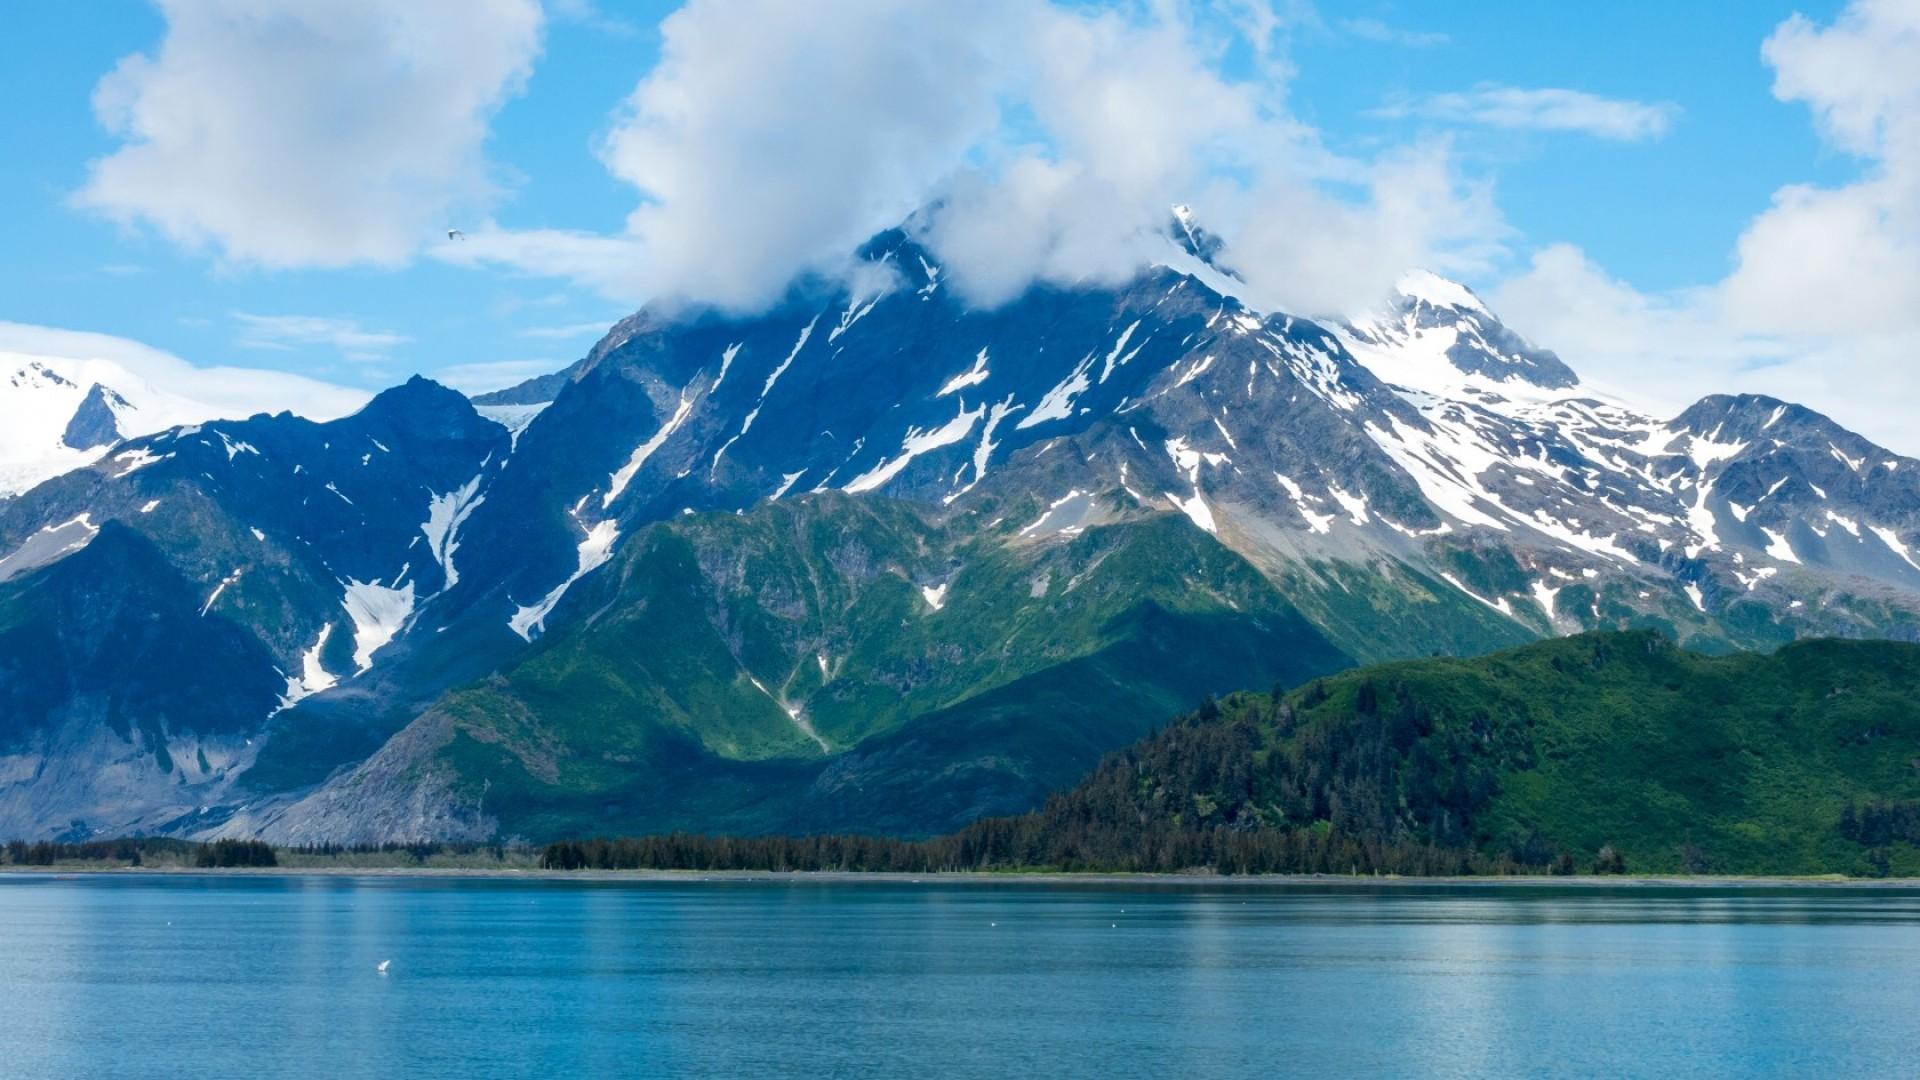 Full HD 1080p Alaska Wallpapers HD, Desktop Backgrounds .